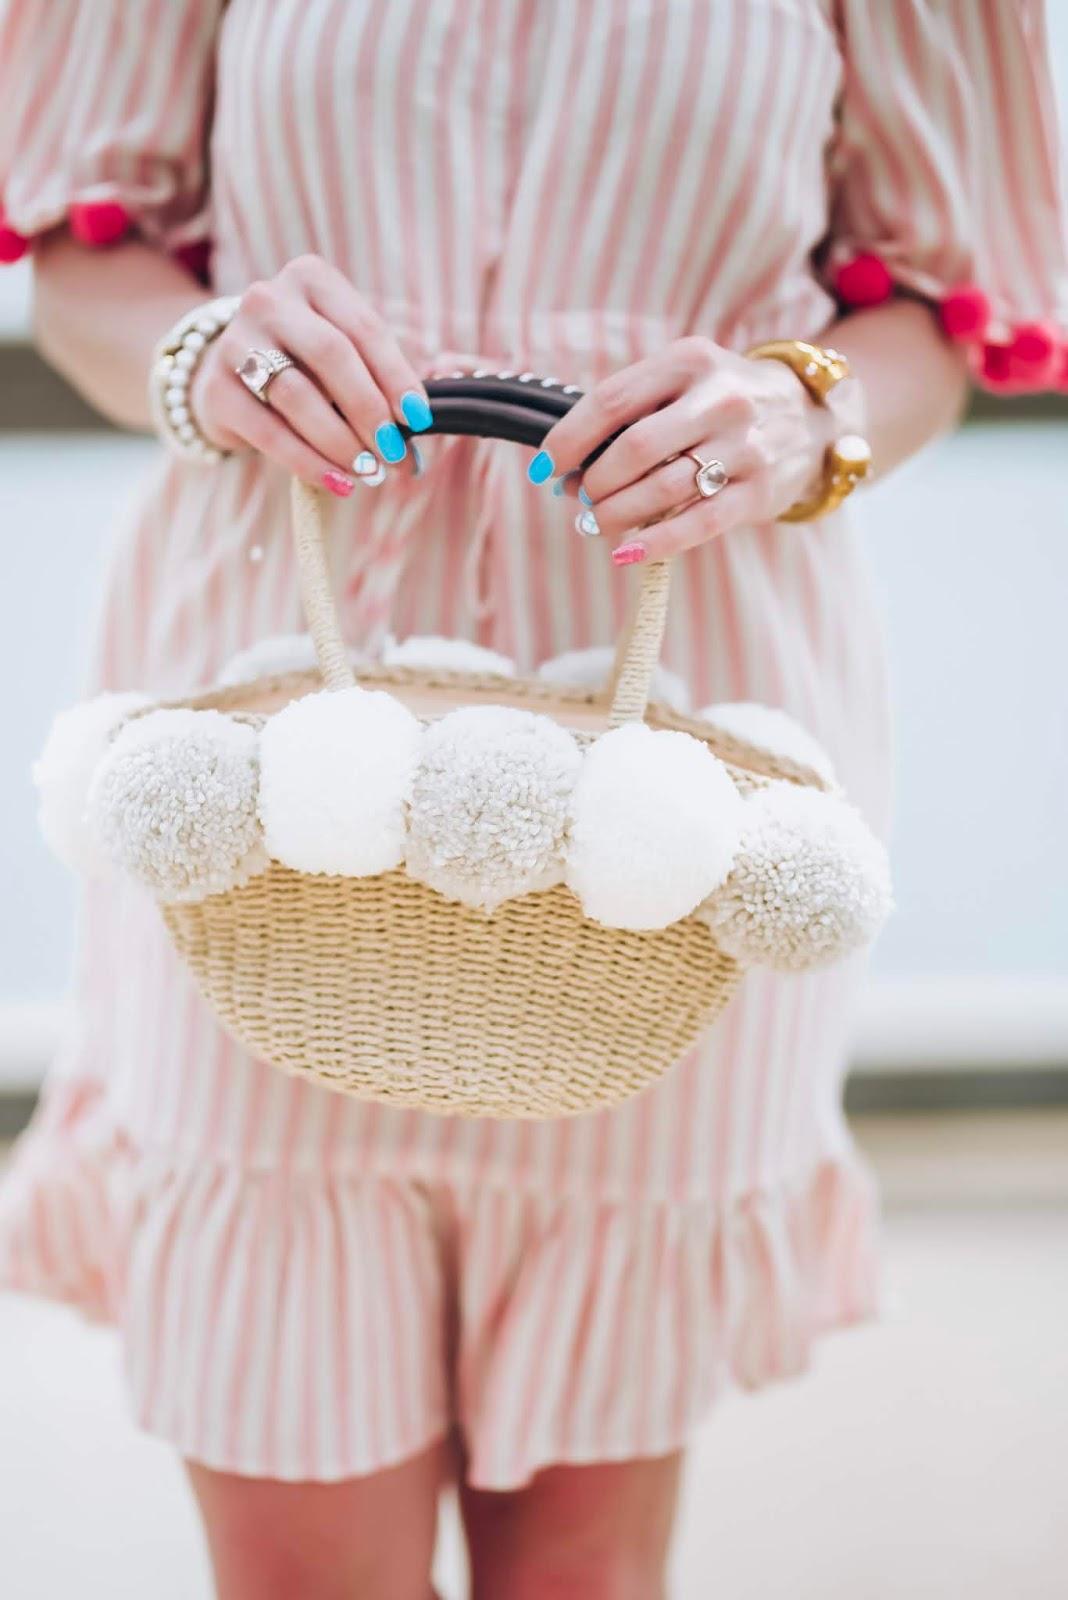 $24 Amazon Pink Stripe Pom Pom Dress + Recent Amazon Finds - Something Delightful Blog